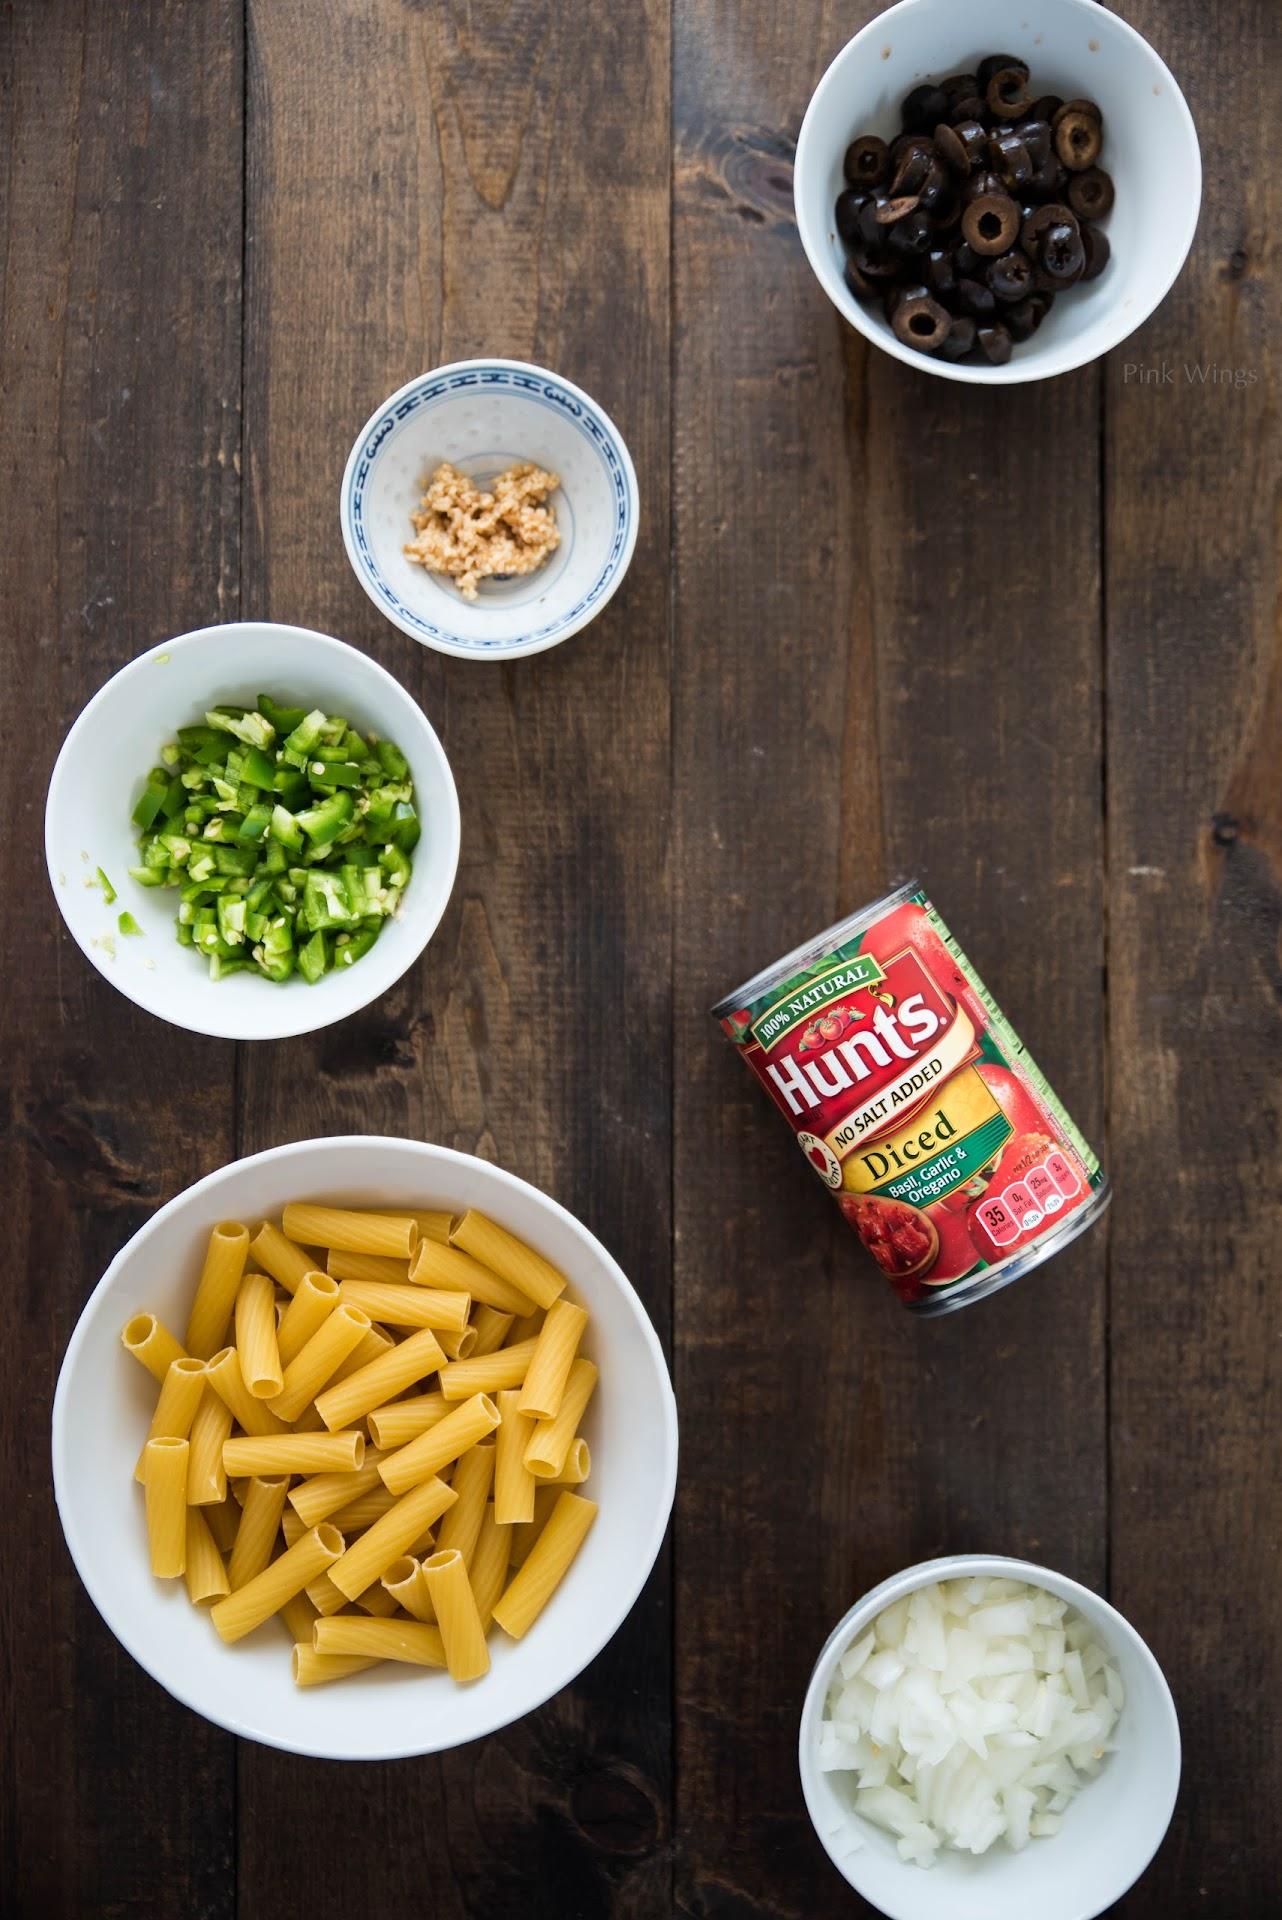 rigatoni pasta recipe, chicken riggies recipe, utica ny food, upstate ny blogger, lds mormon food blogger, one pot pasta dish recipe, creamy pasta sauce, spicy, hunt's diced tomatoes recipe